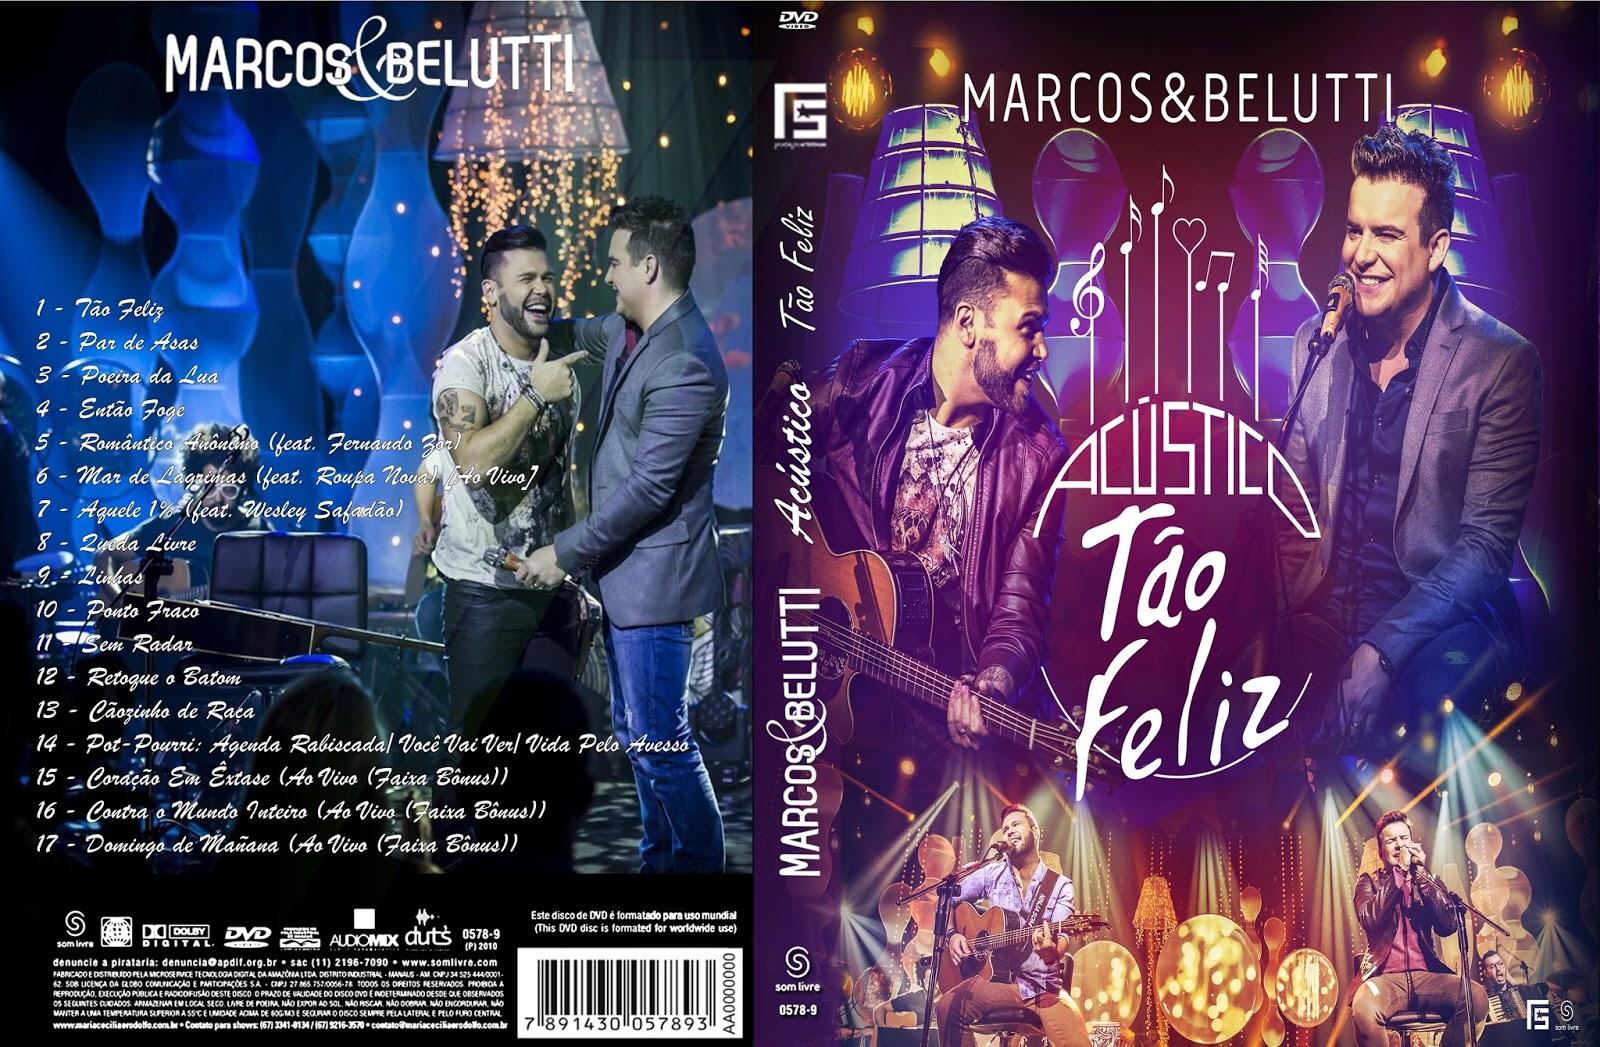 Download Marcos & Belutti Tão Feliz Acústico ao Vivo DVDRip XviD 2015 Marcos 2B 2526 2BBelutti 2BAc 25C3 25BAstico 2BT 25C3 25A3o 2BFeliz 2B  2BCapa 2BM 25C3 25BAsica 2BDVD